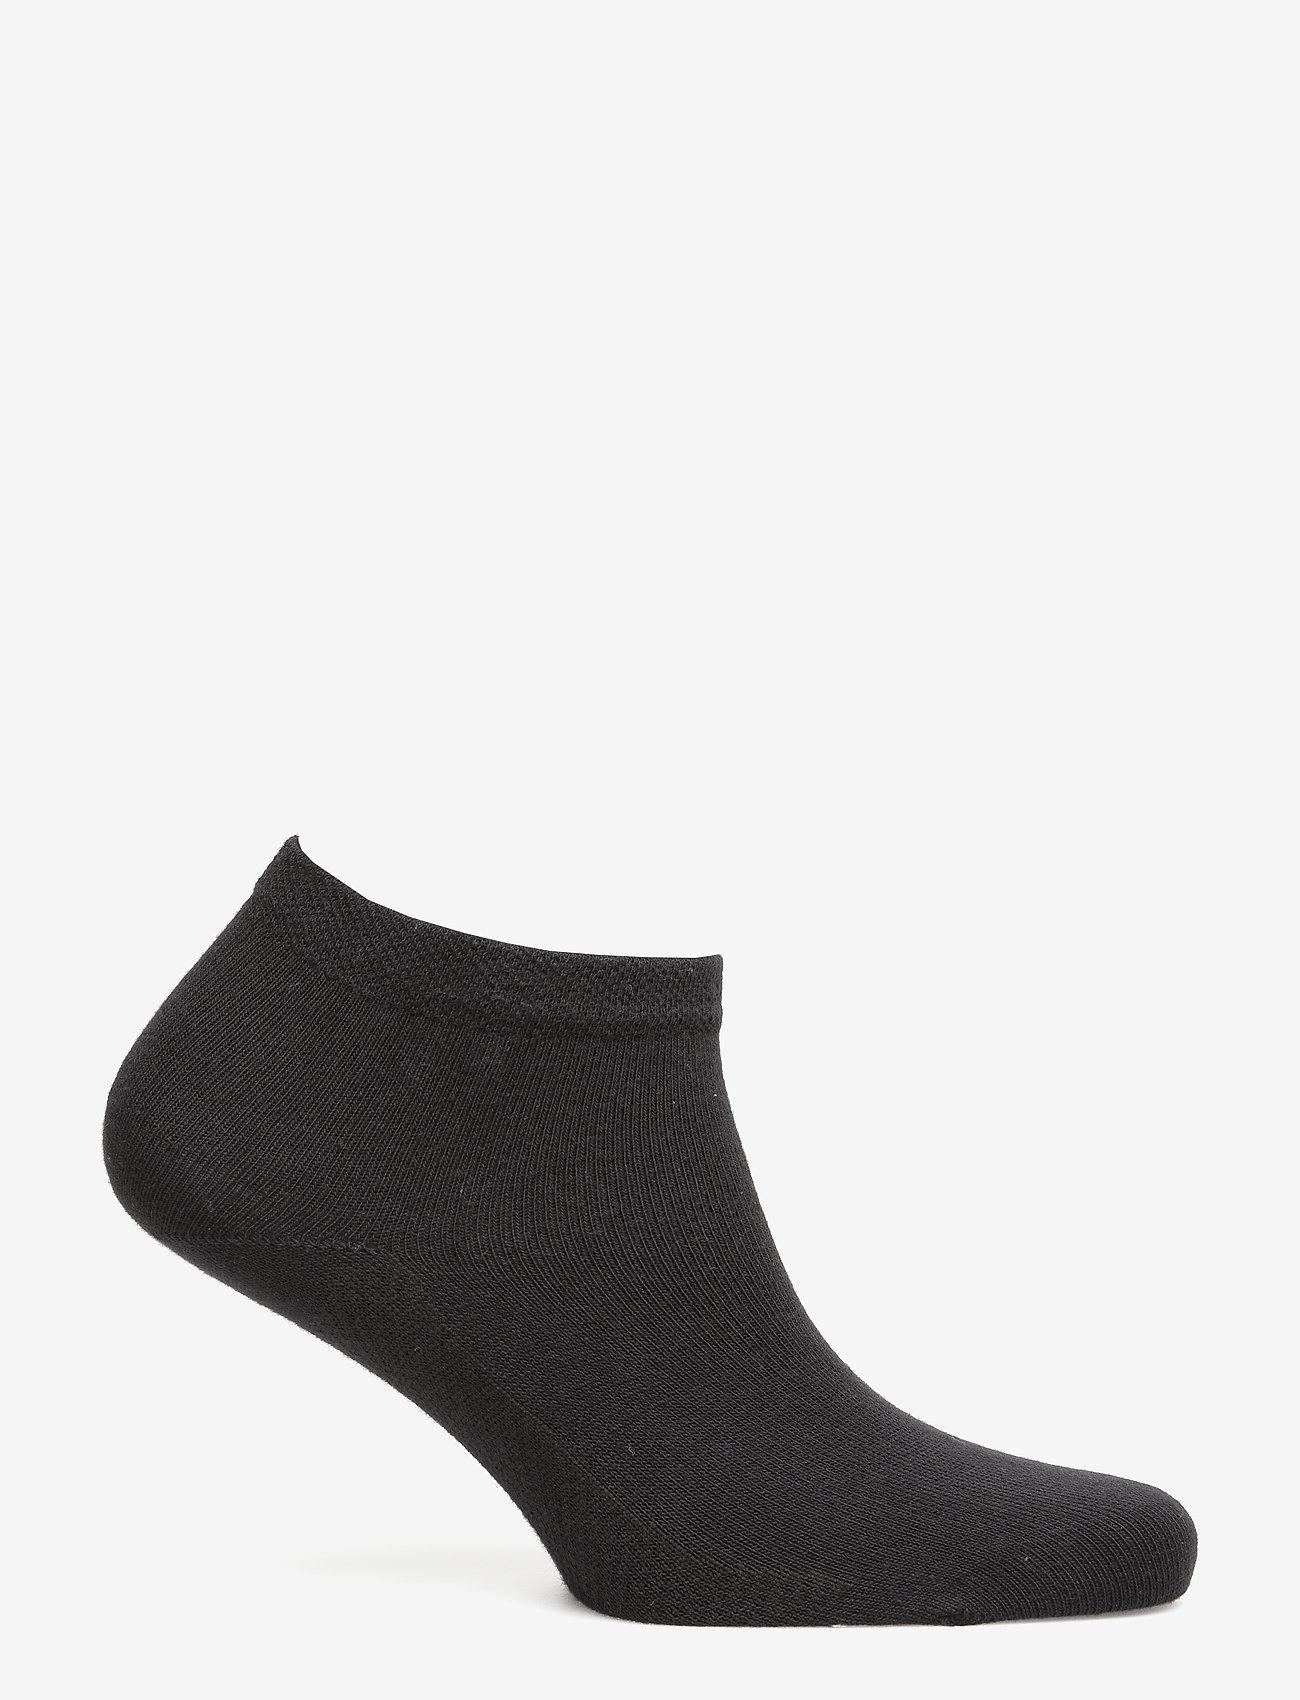 Hudson - DRY COTTON - footies - black - 1